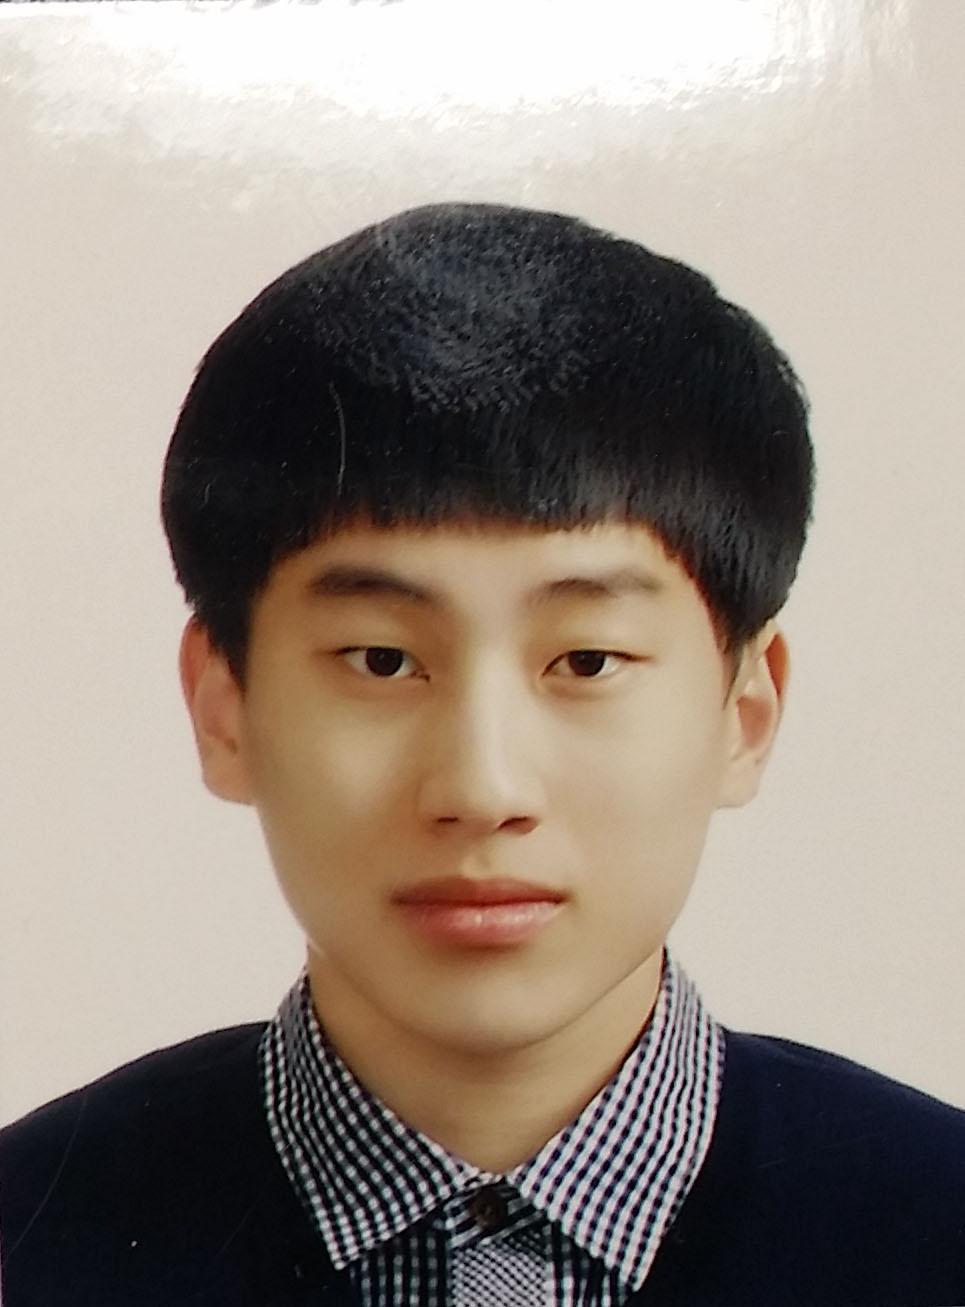 Mr. Ji Seung - Student of Electrical & Electronic Engineering at Yonsei University